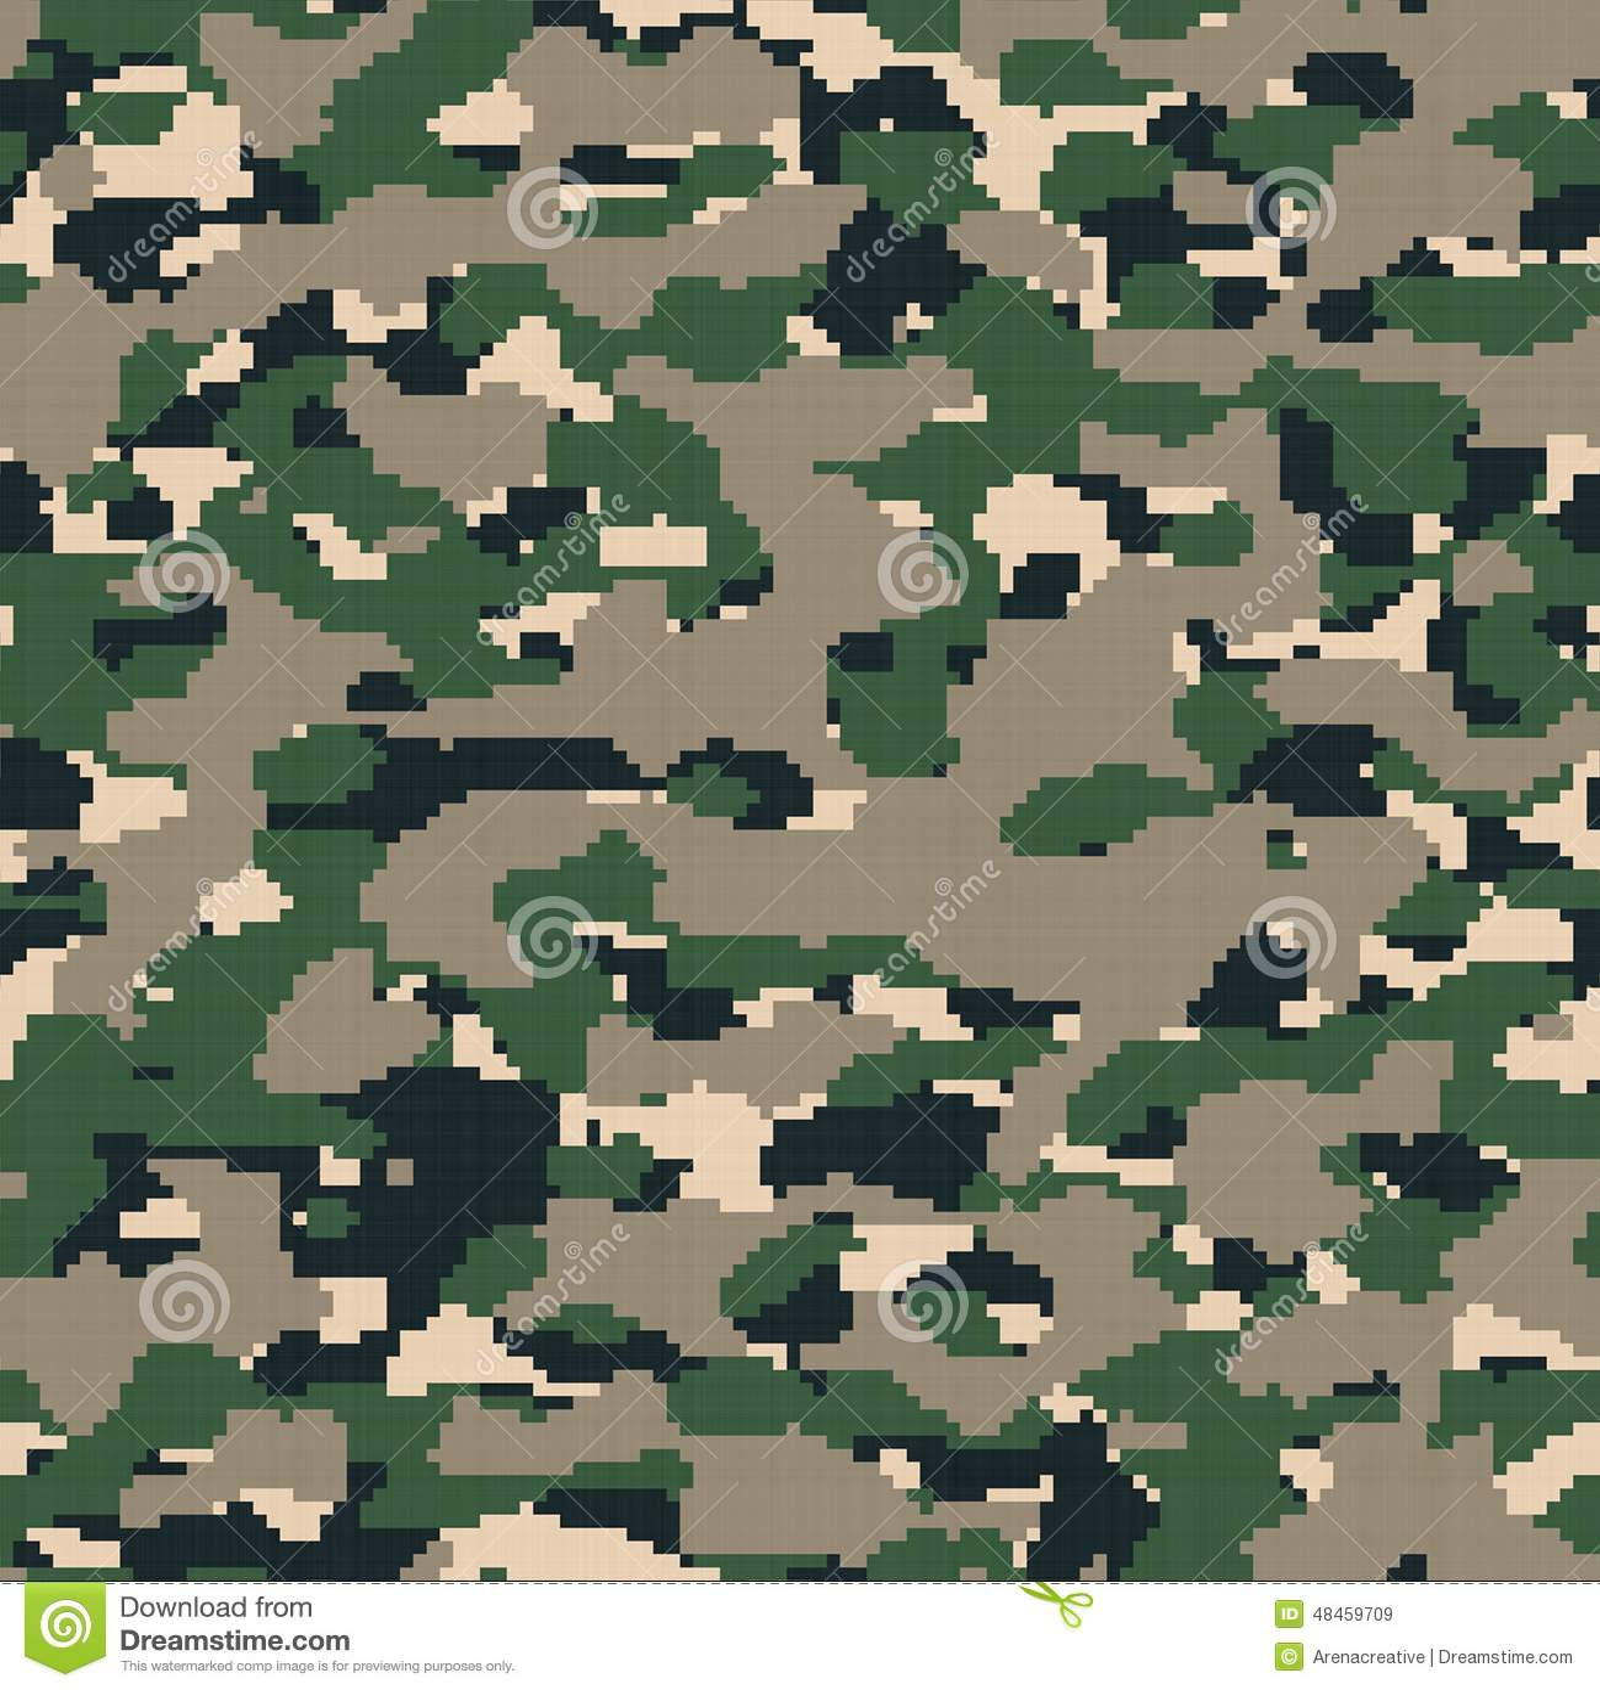 Digital Army Camouflage Stock Illustration Illustration